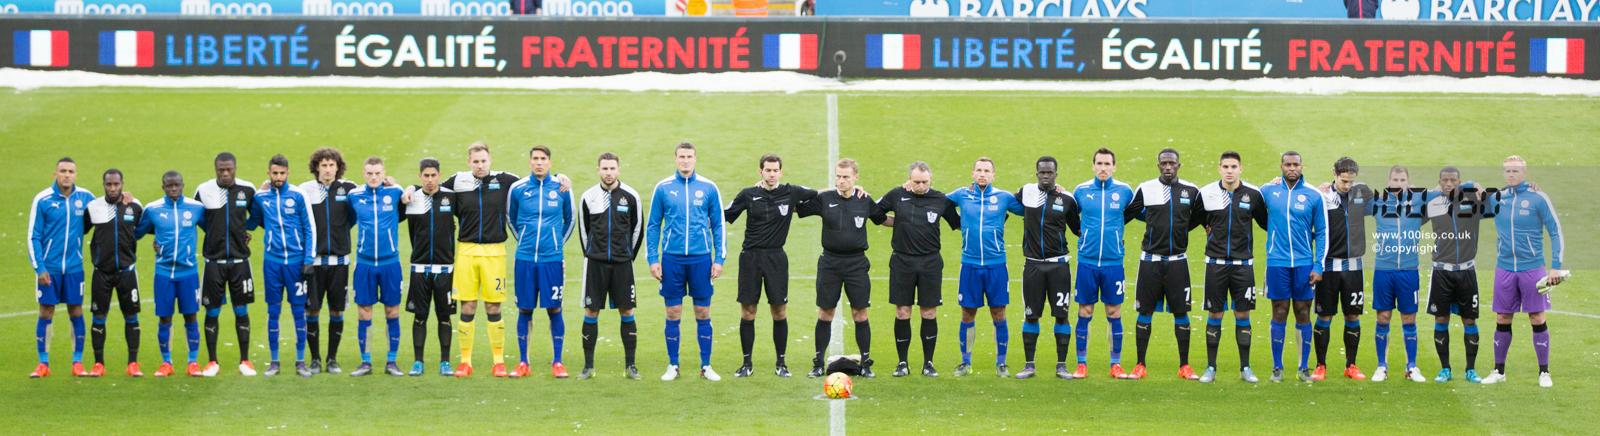 Football remembers Paris – 21st November 2015